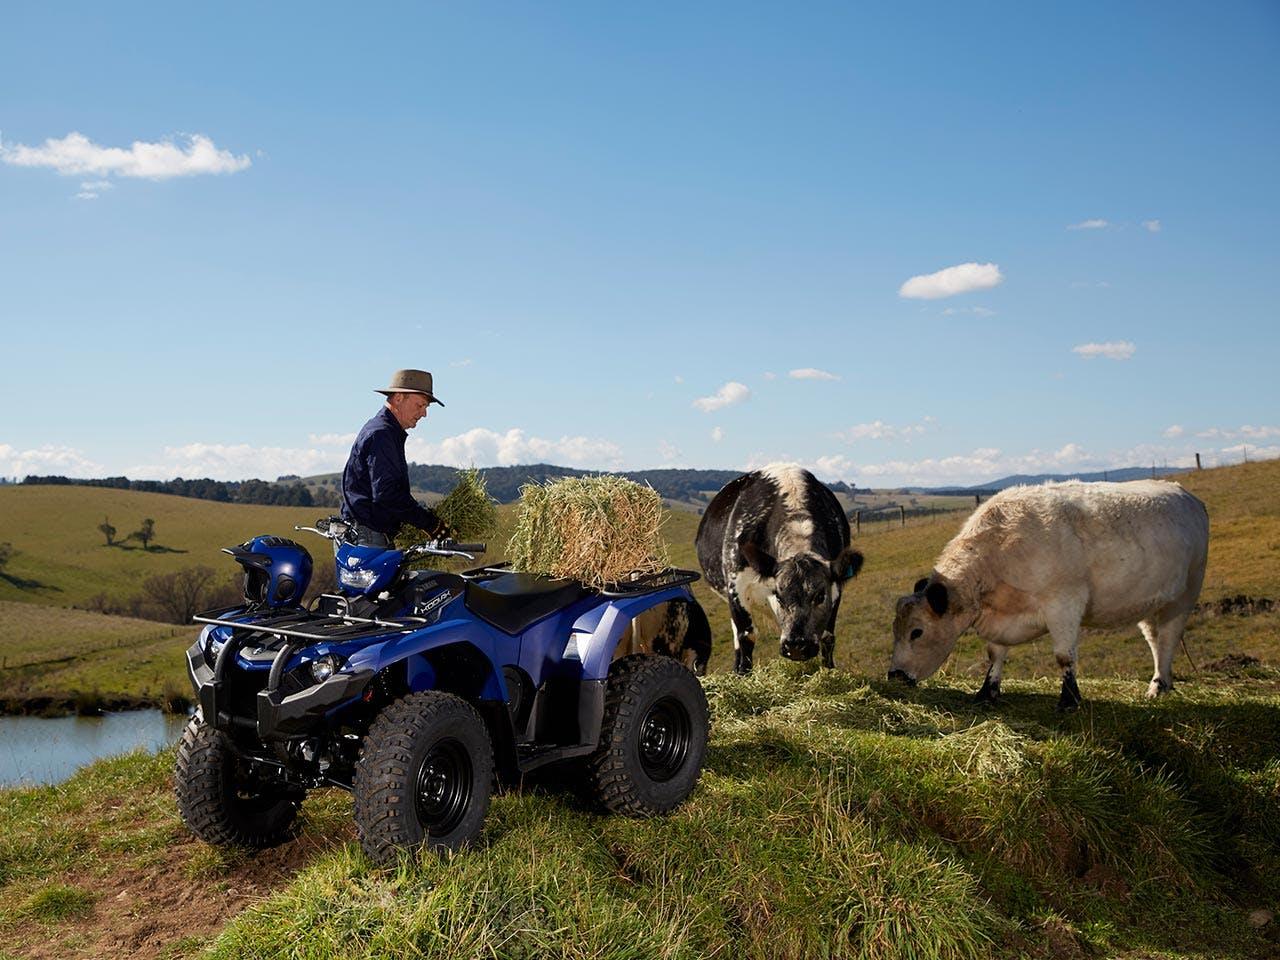 Yamaha Kodiak 450 EPS in steel blue colour towing hay bales